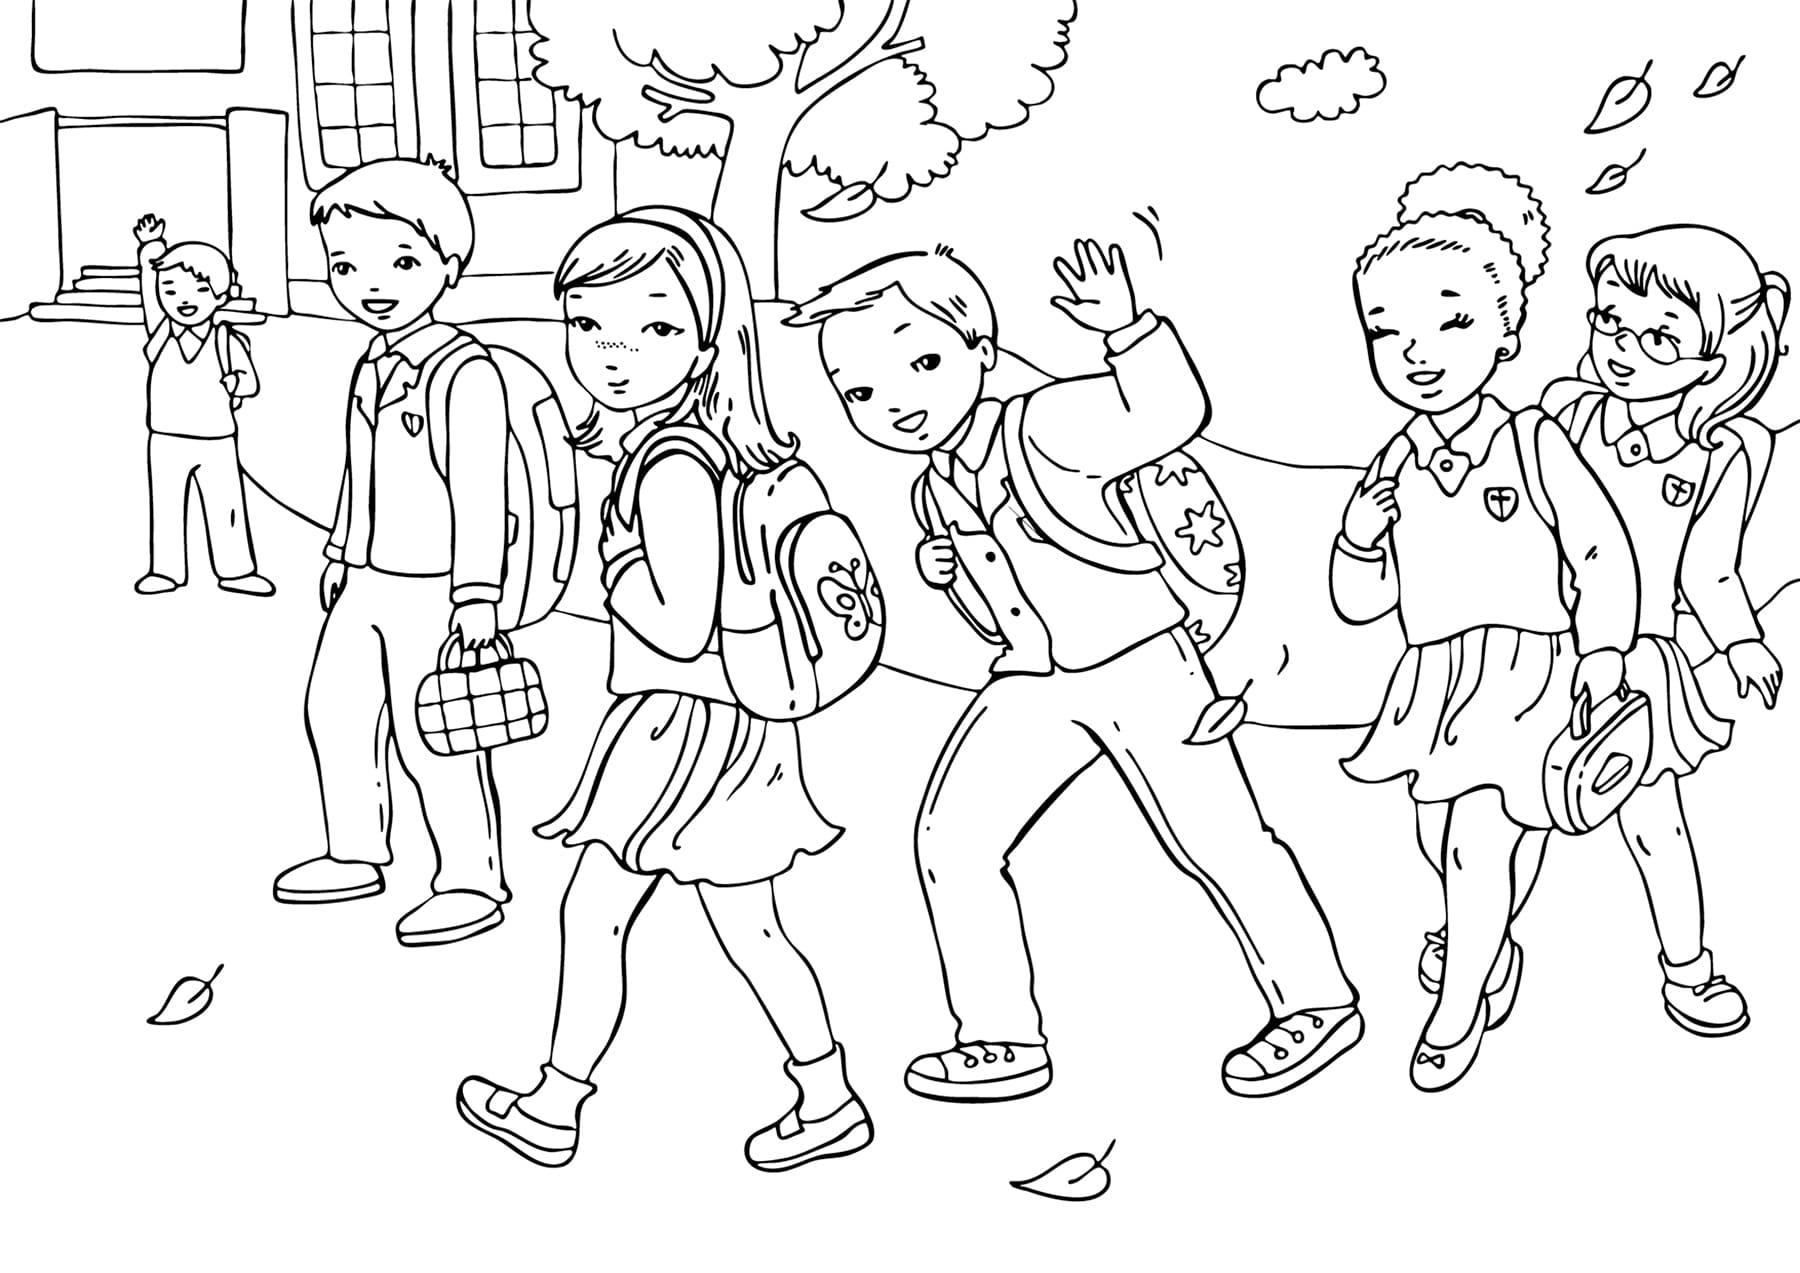 Картинки, картинки про школу для детей черно белые